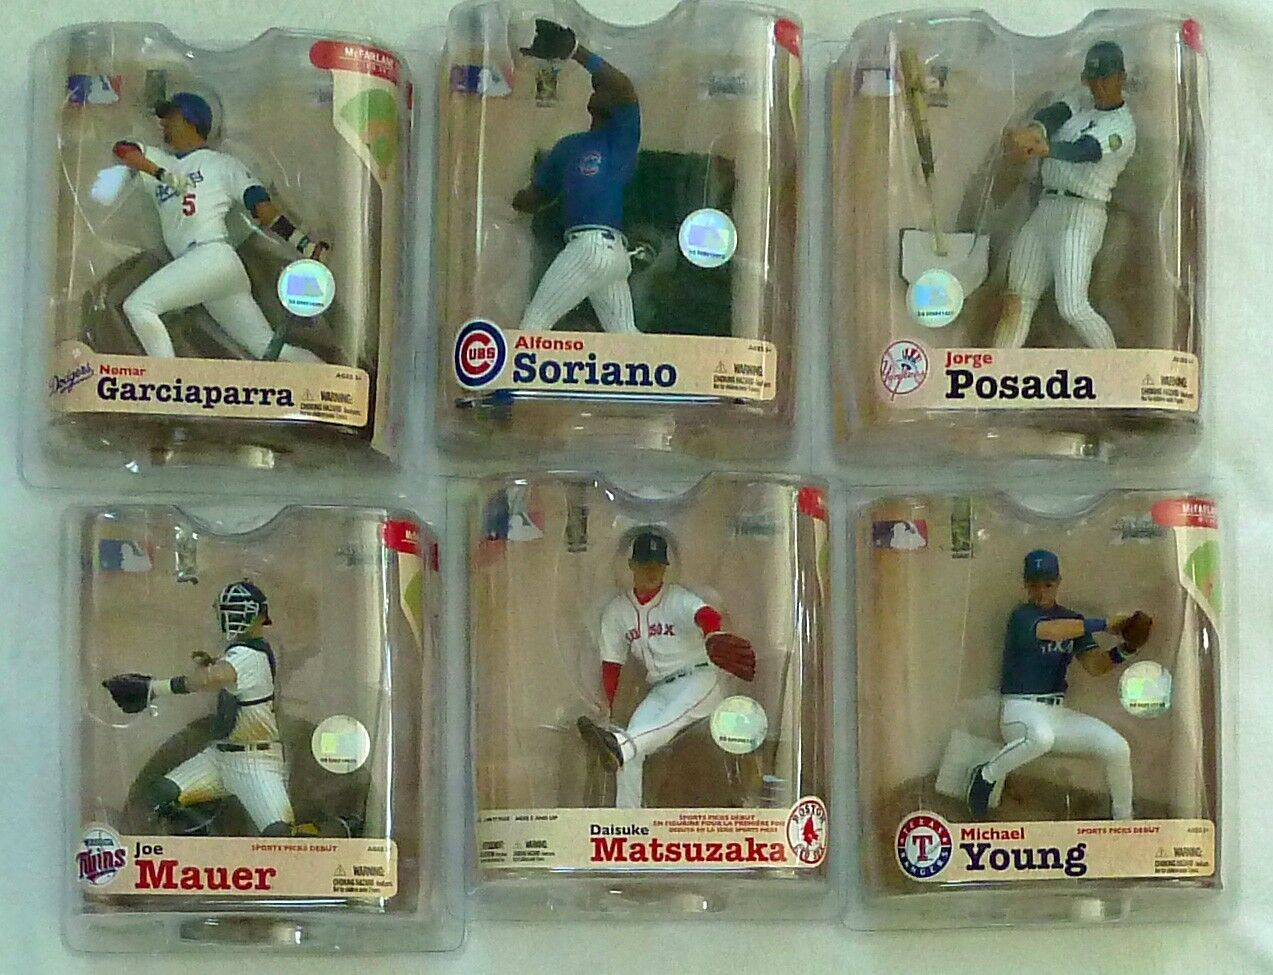 McFarlane MLB 11 COMPLETE SET Damon,Griffey,Guerrero,Halladay,Piazza,Prior,ARod